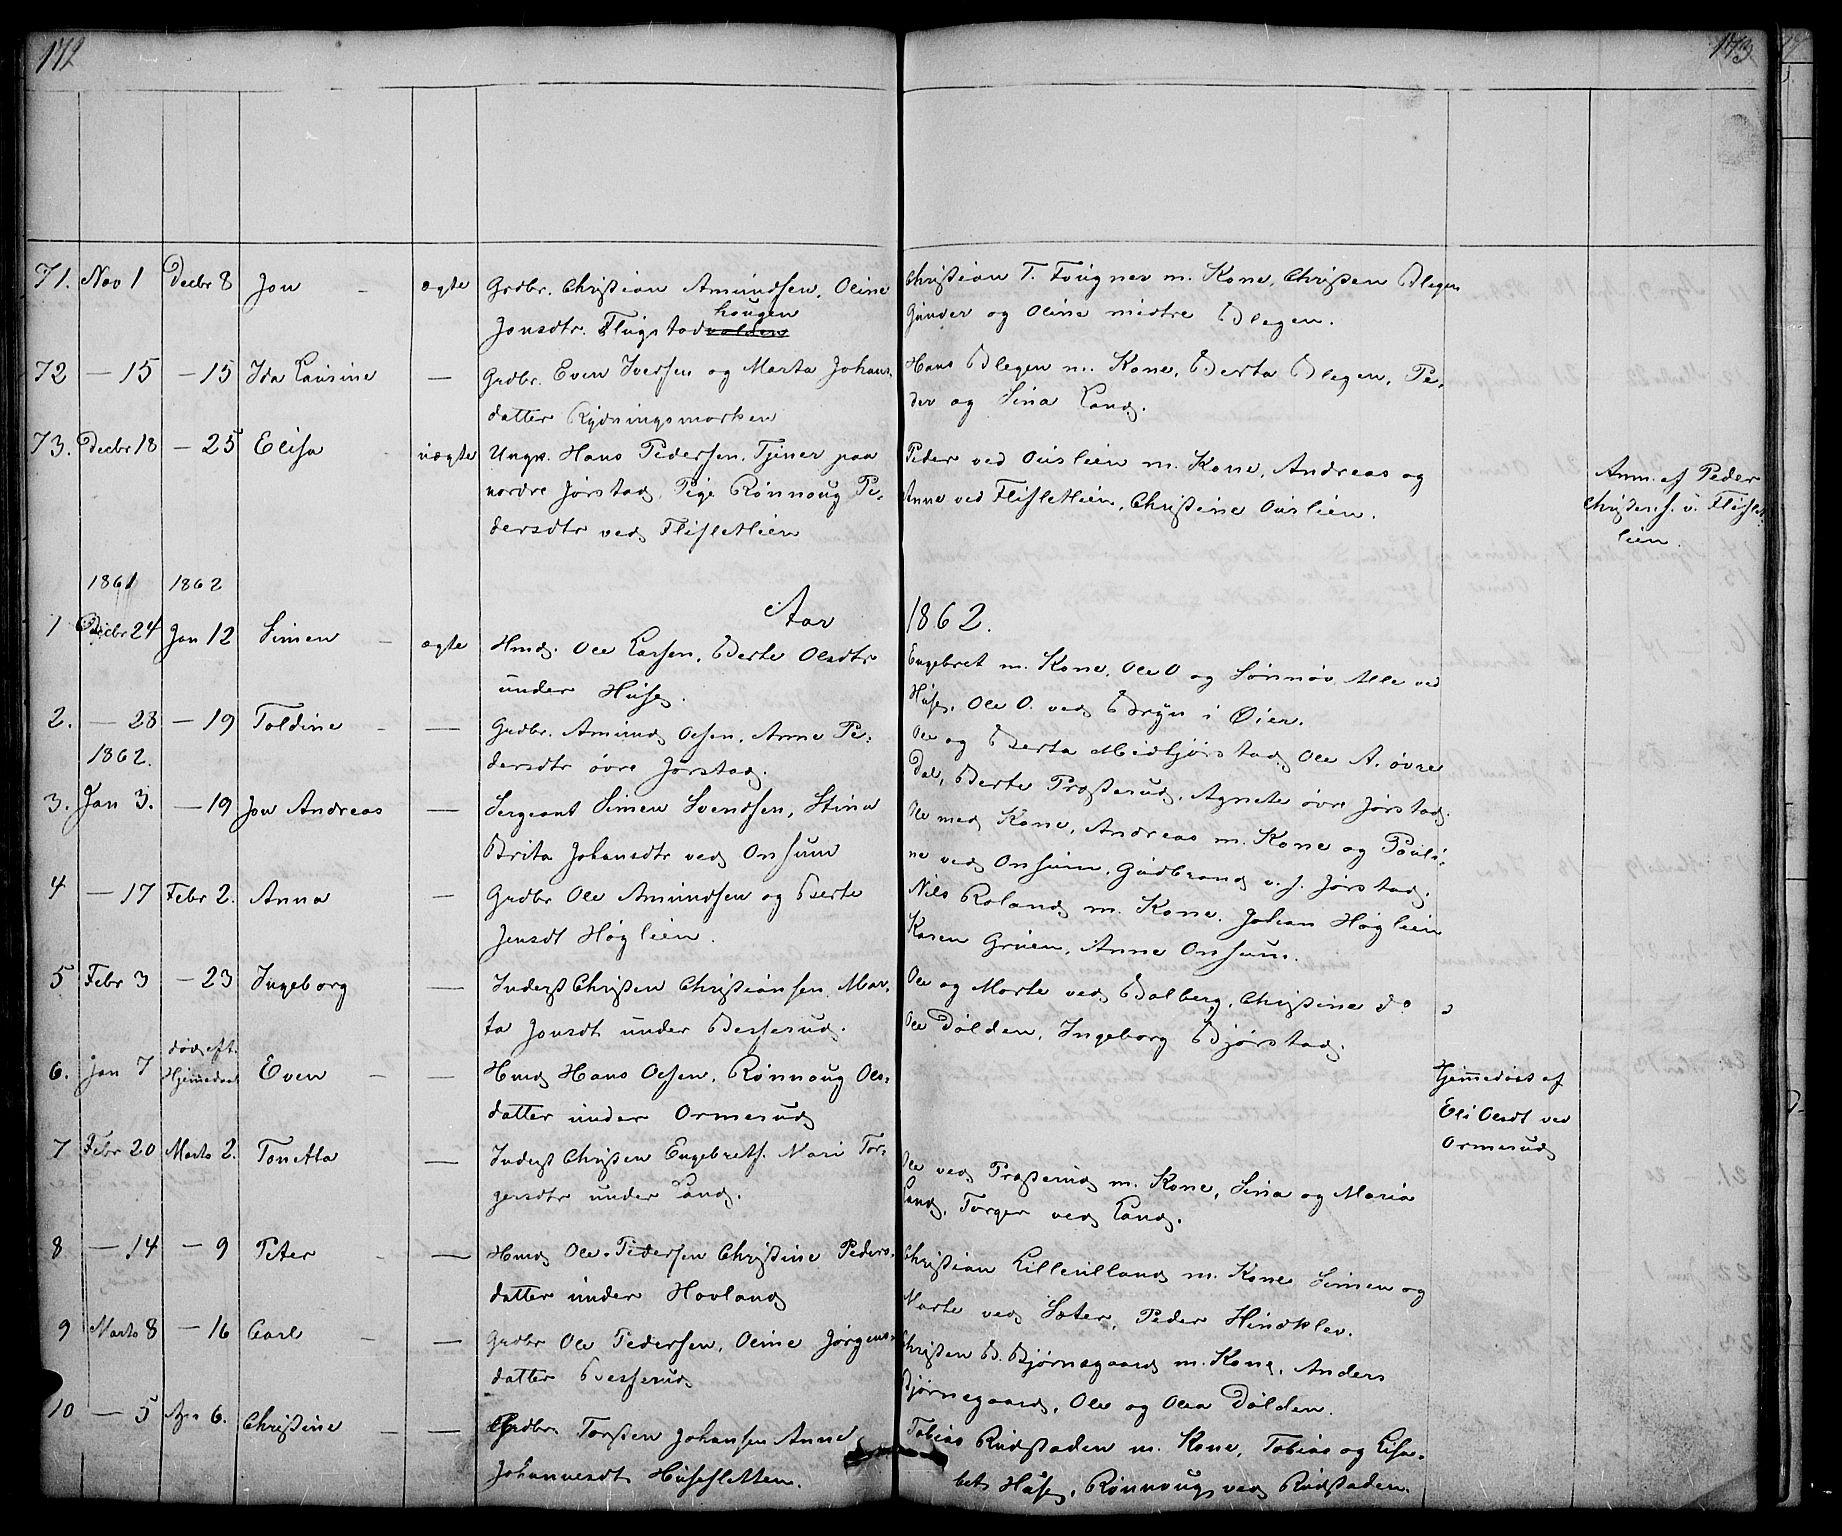 SAH, Fåberg prestekontor, Klokkerbok nr. 5, 1837-1864, s. 172-173